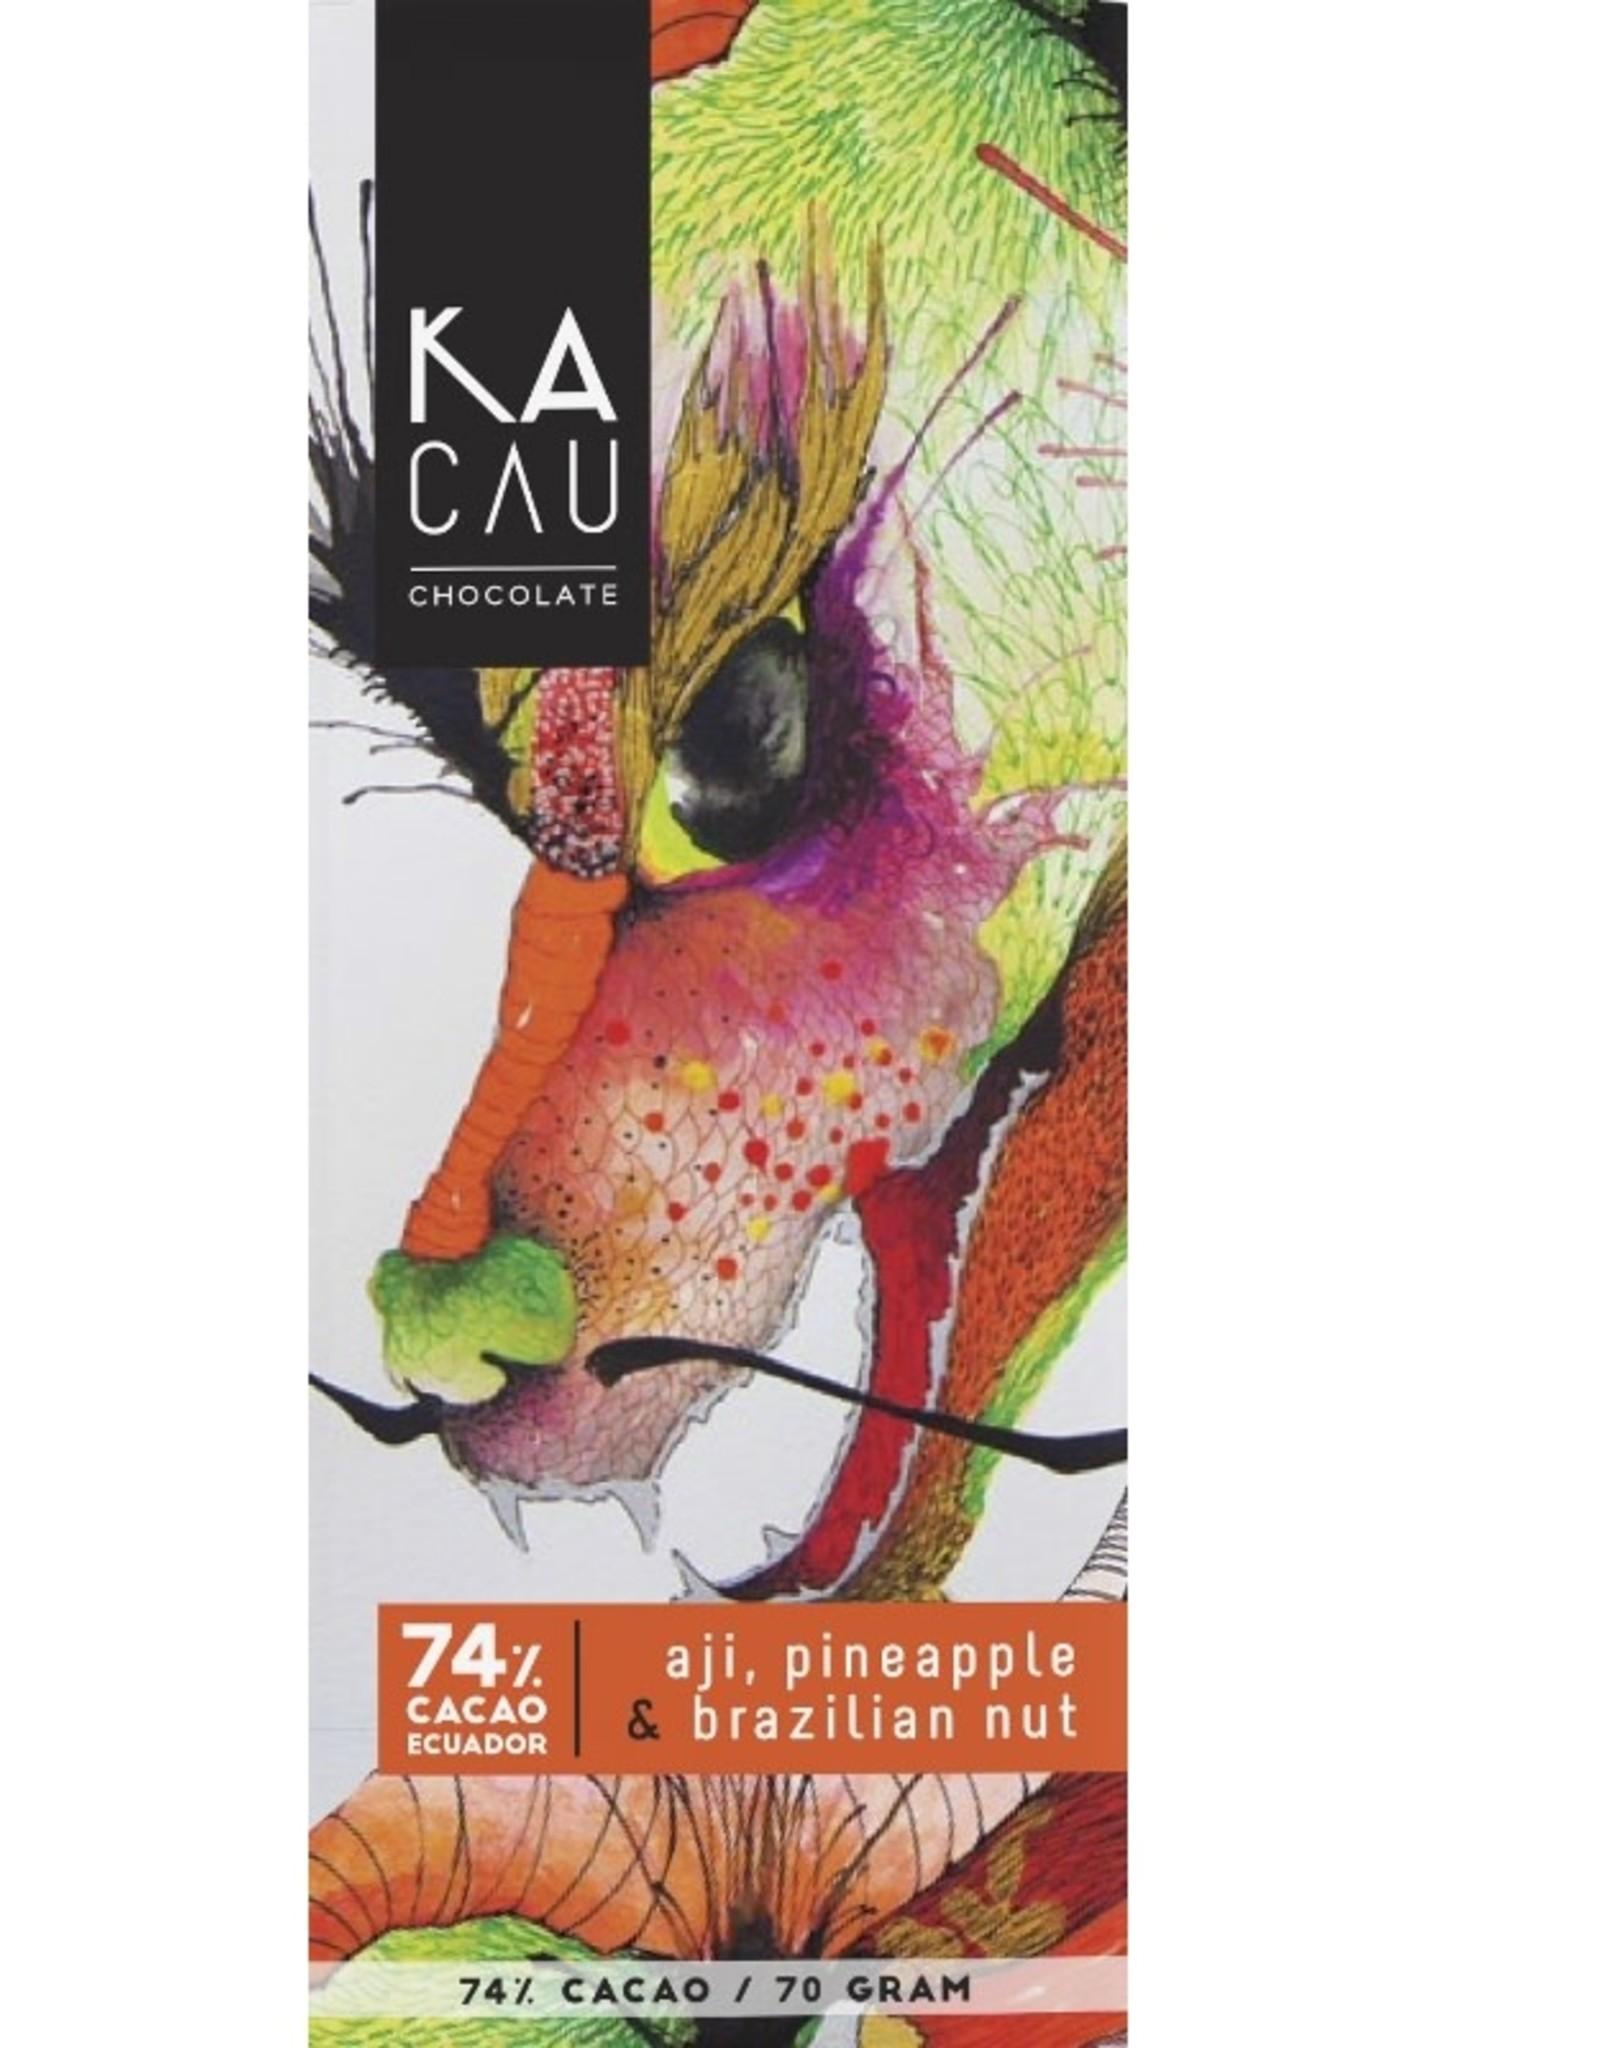 Kacau, Ecuador Hete peper, Ananas, Amazone noten puur 74%